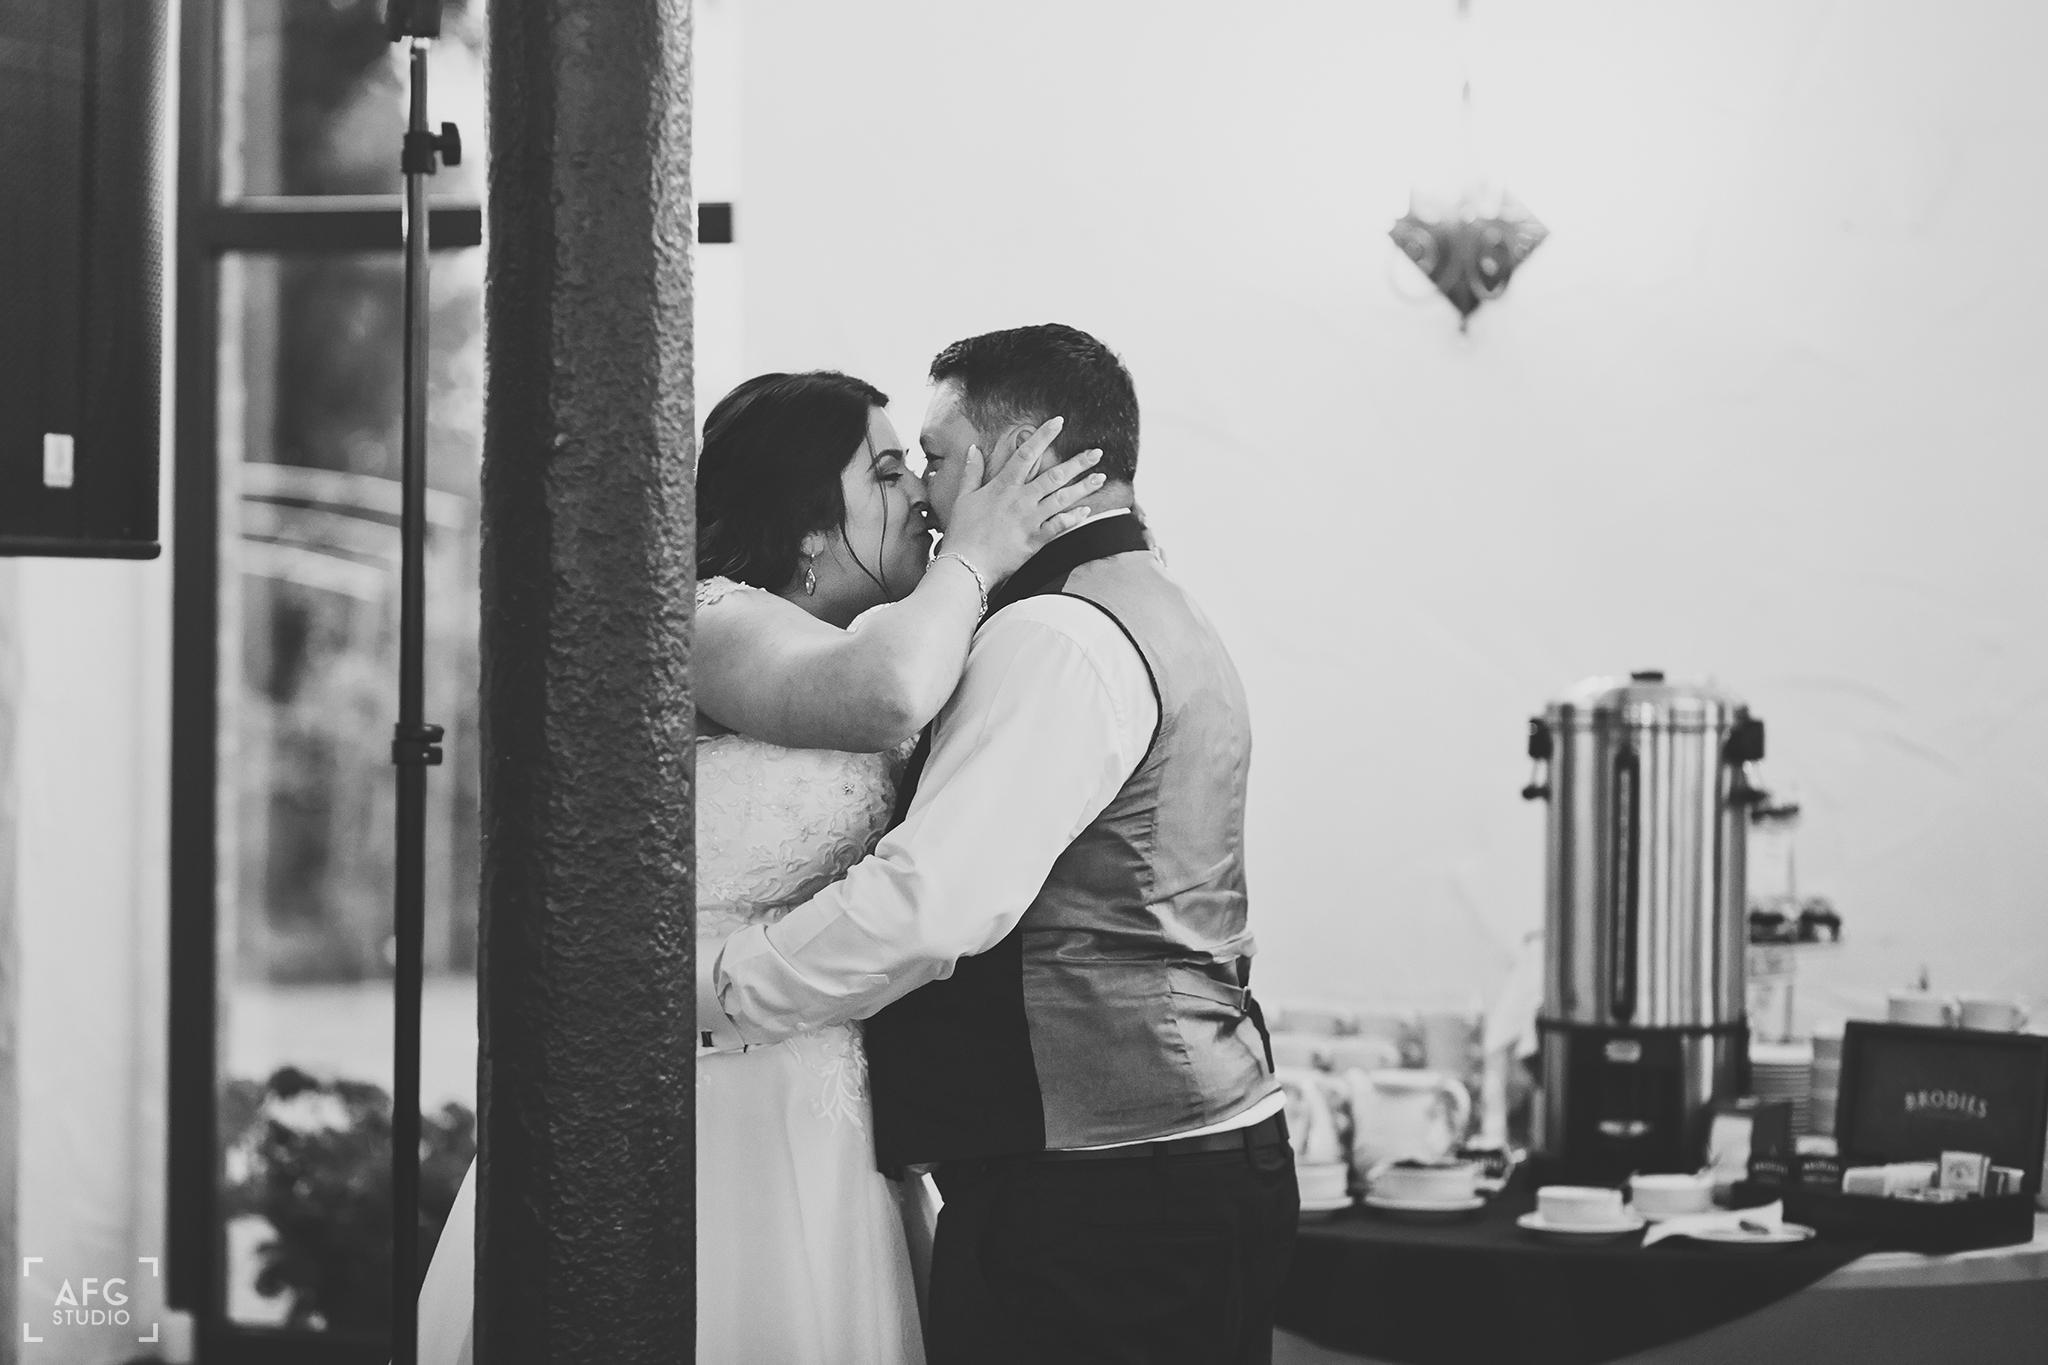 pocałunek, nowozeńcy, wesele